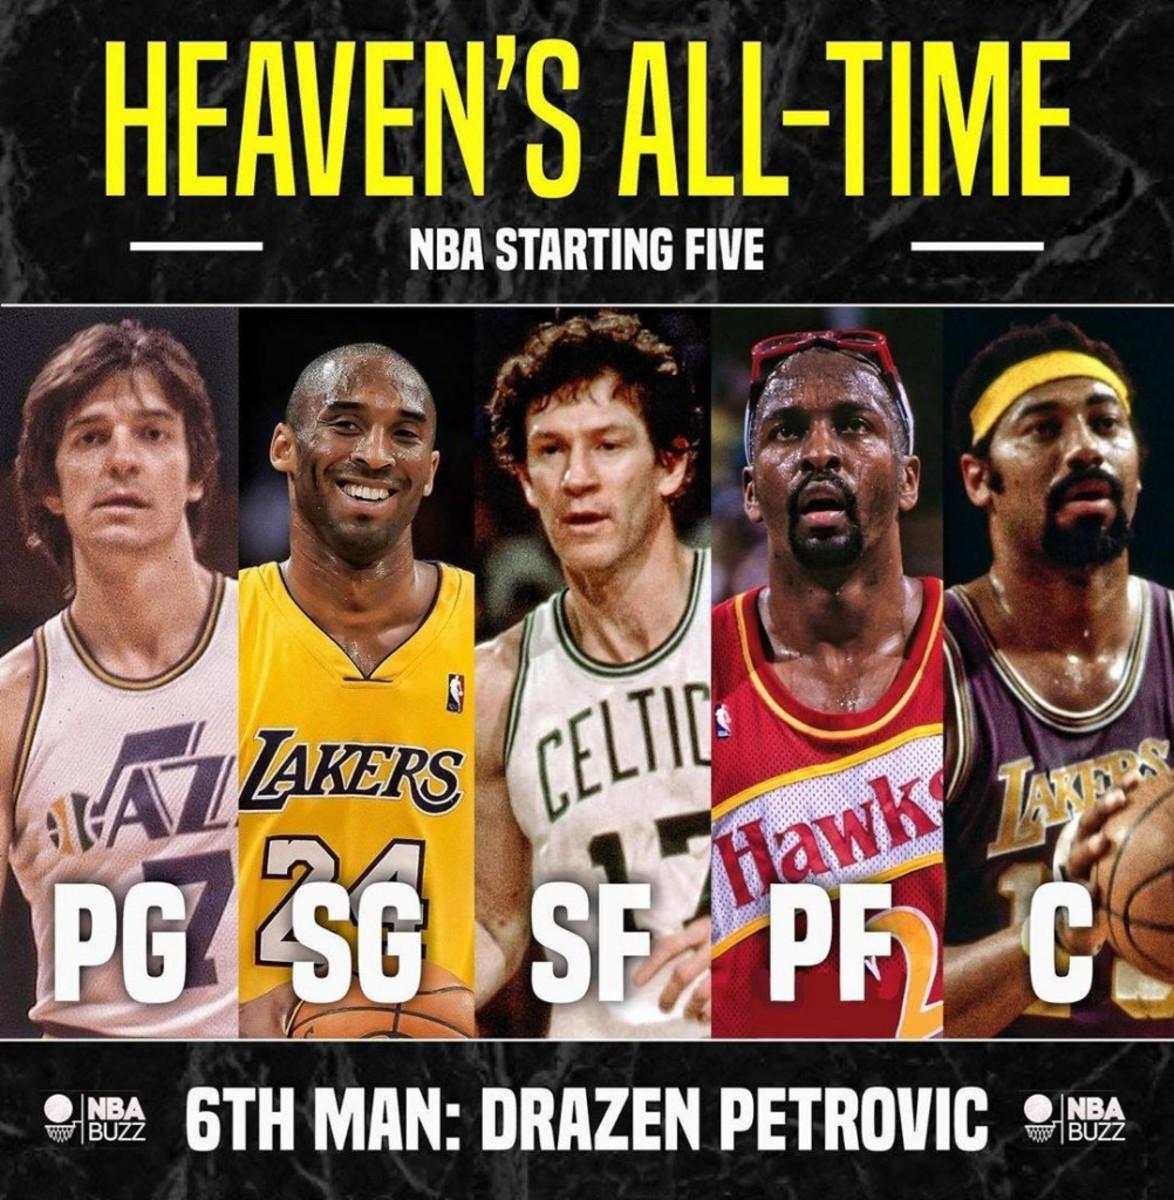 Credit: NBA Buzz